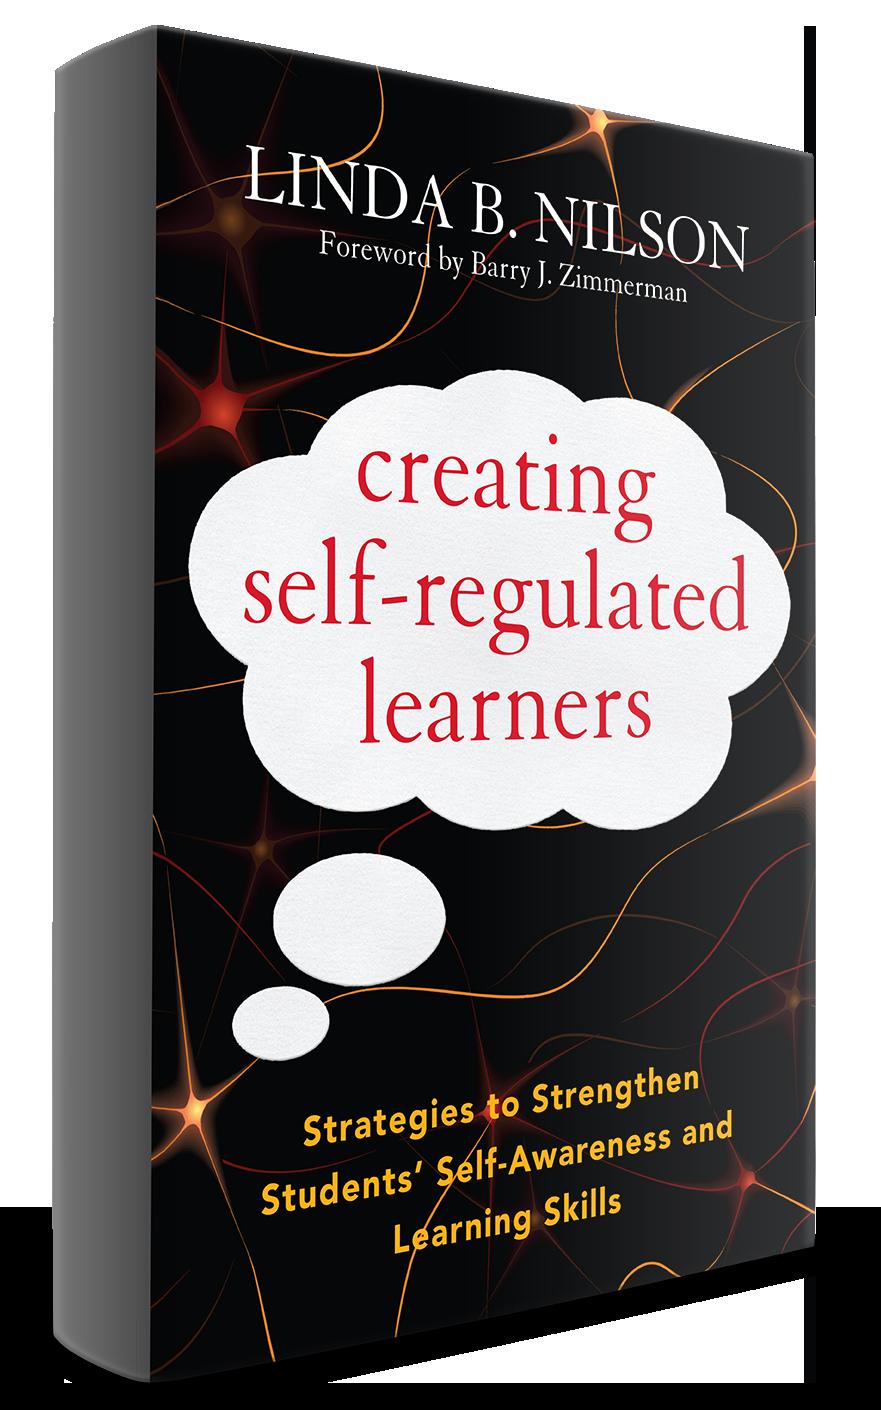 Creating Self-regulated Learners